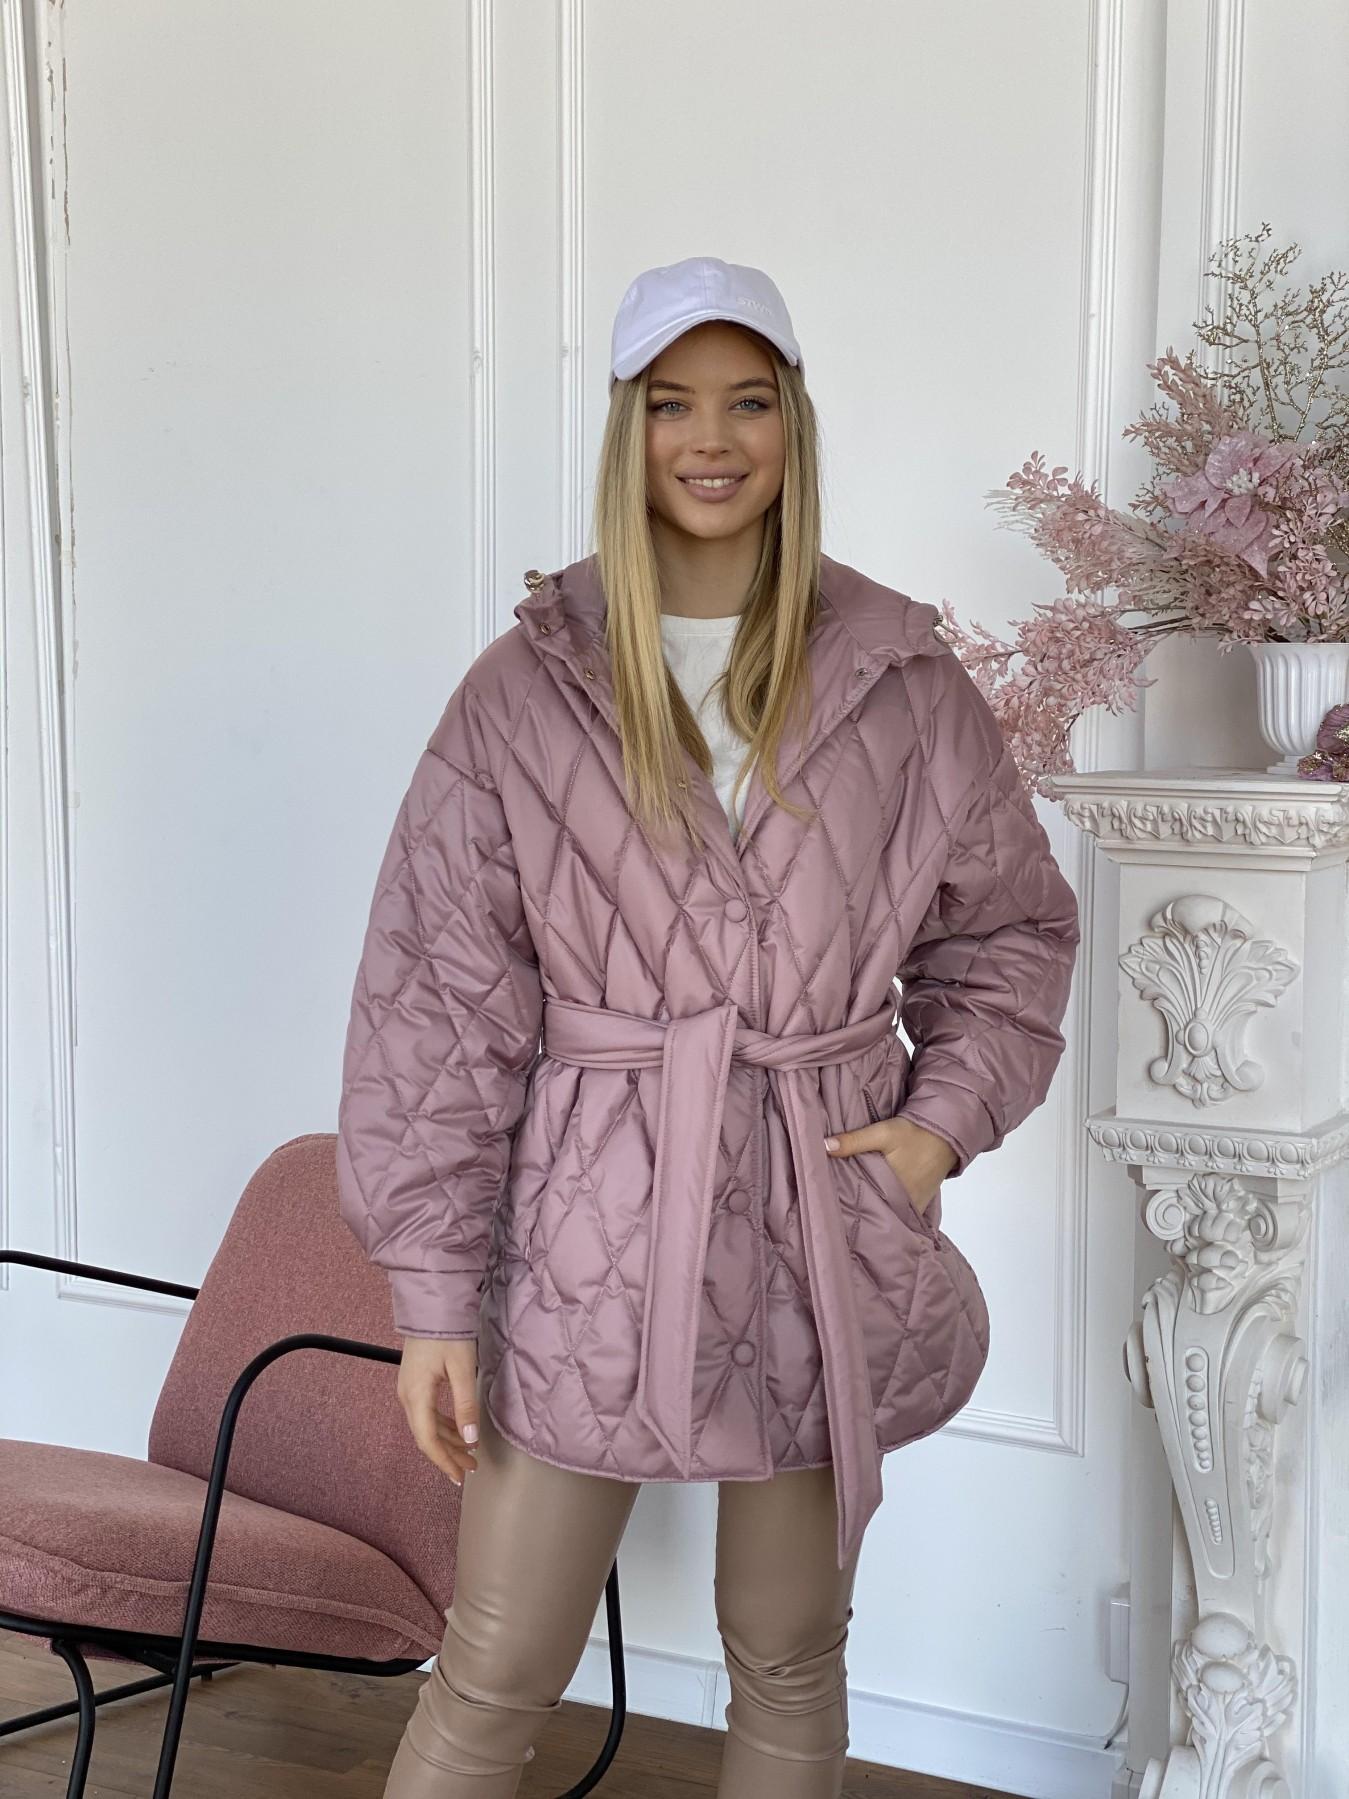 Пазл стеганая куртка из плащевки 10890 АРТ. 47400 Цвет: Пудра - фото 8, интернет магазин tm-modus.ru